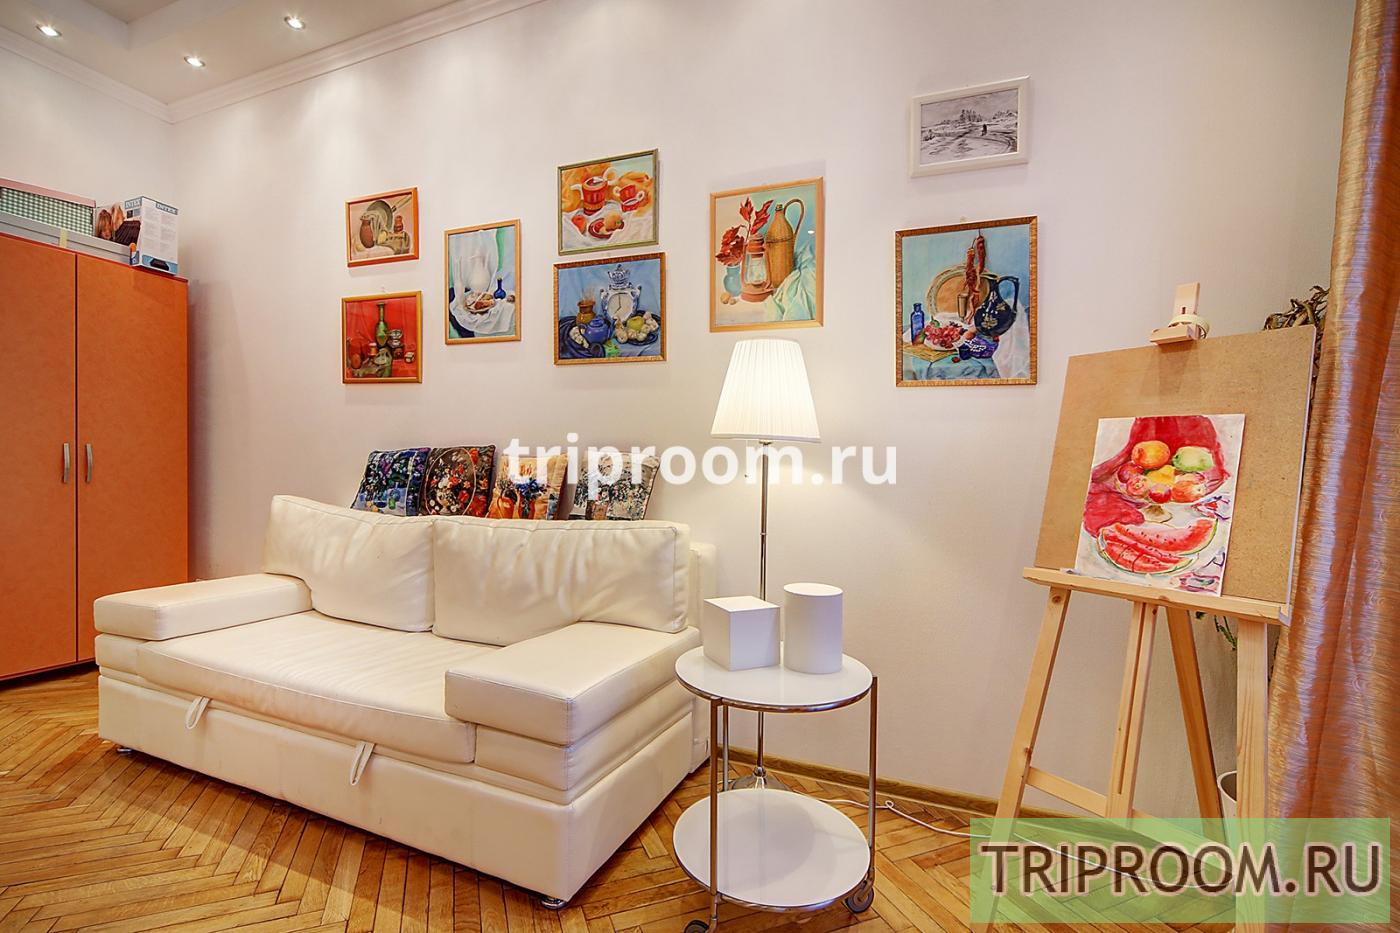 2-комнатная квартира посуточно (вариант № 15426), ул. Лиговский проспект, фото № 7